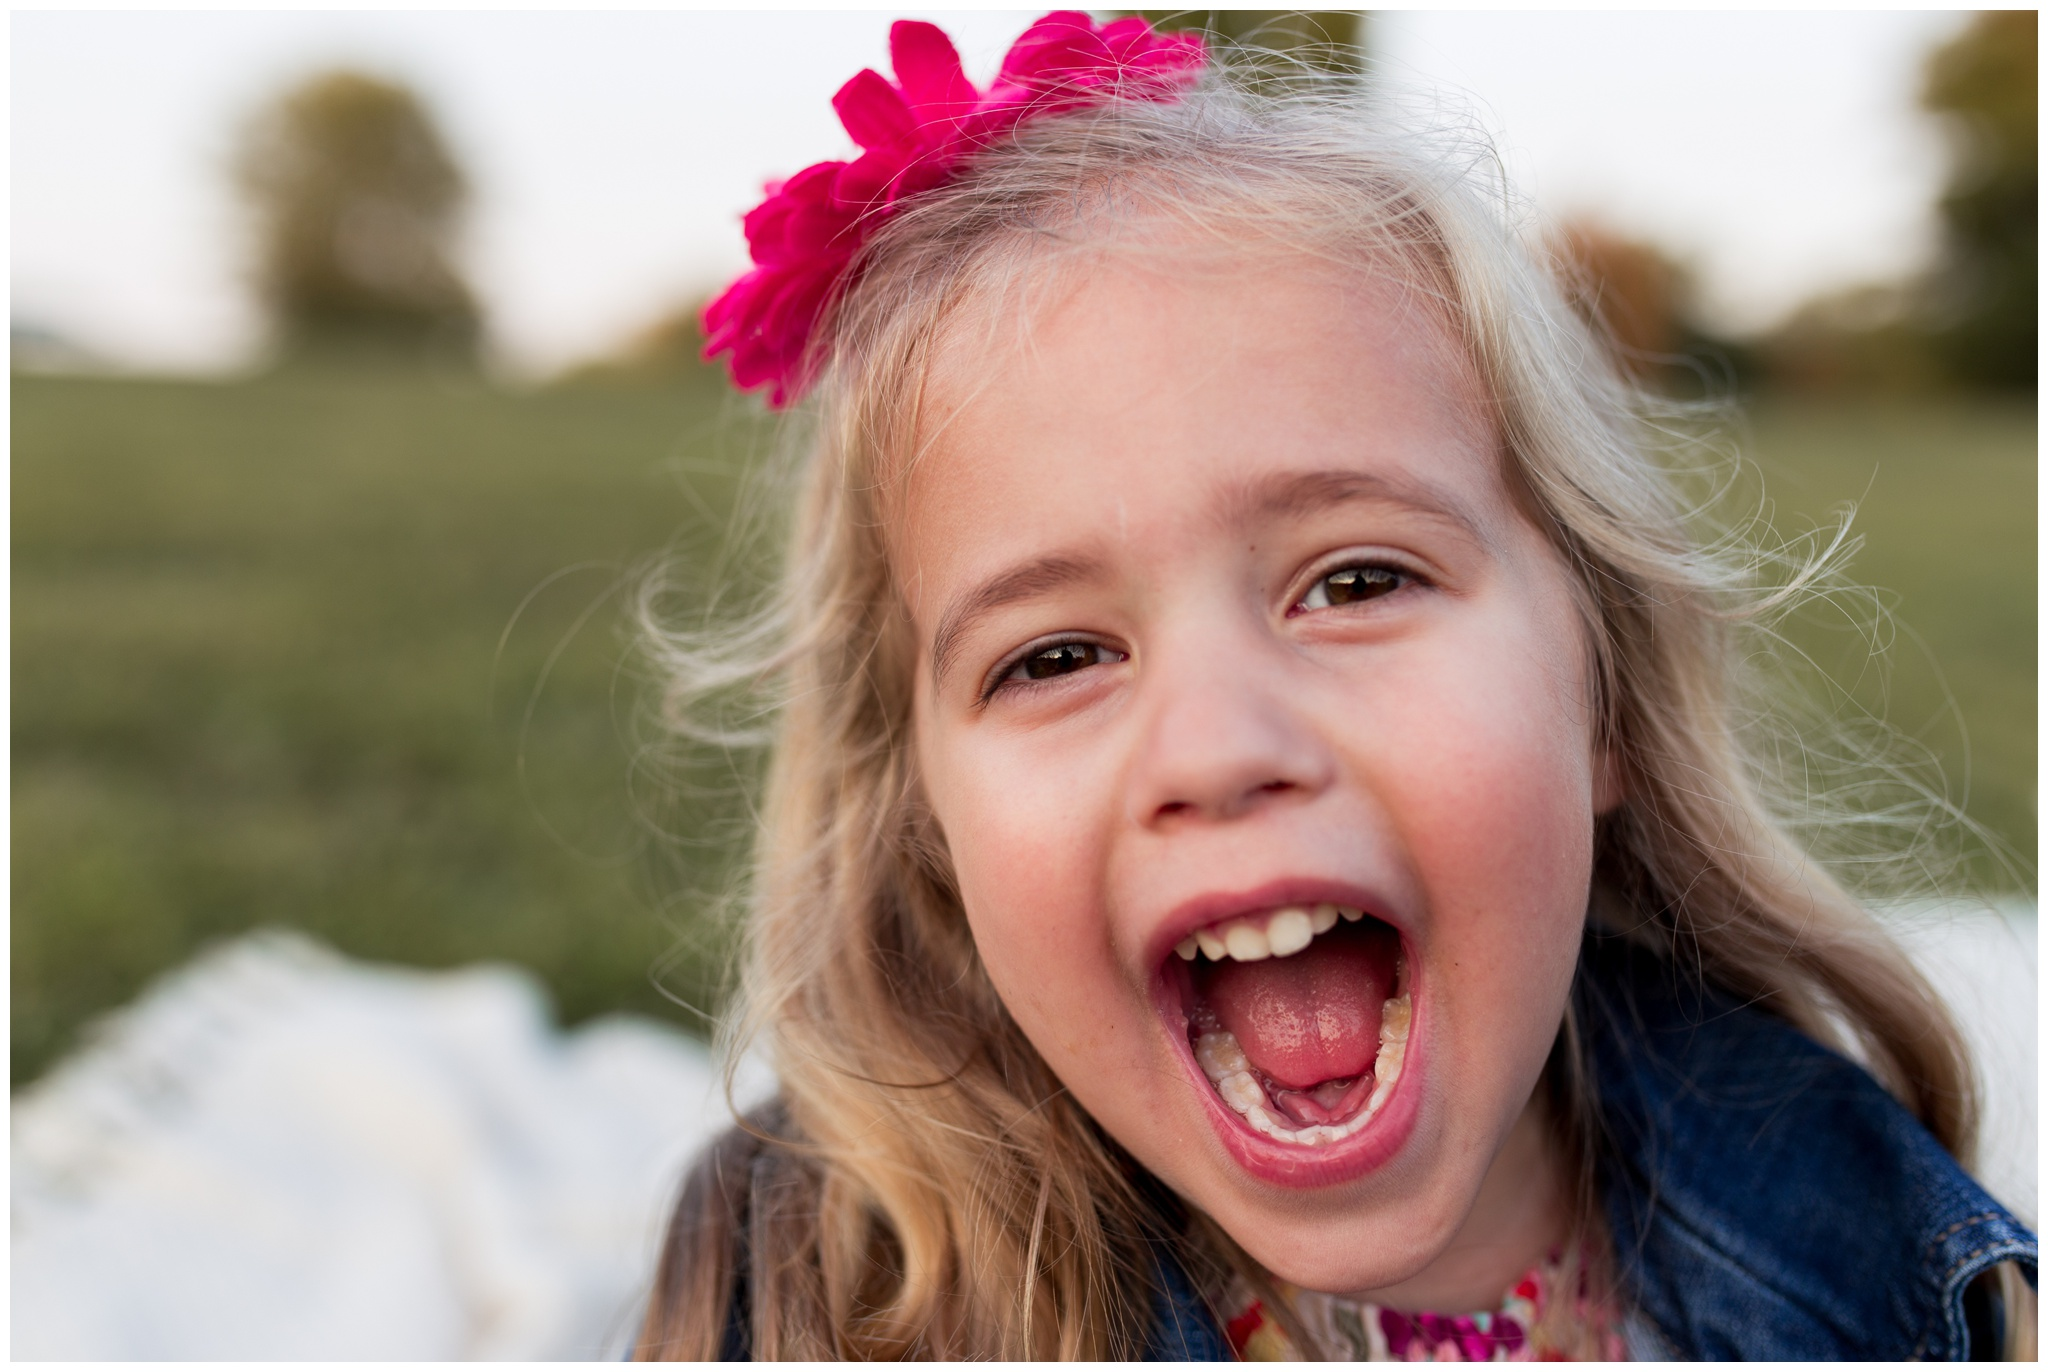 little girl in front of camera at Wildcat Creek Reservoir Park in Kokomo Indiana